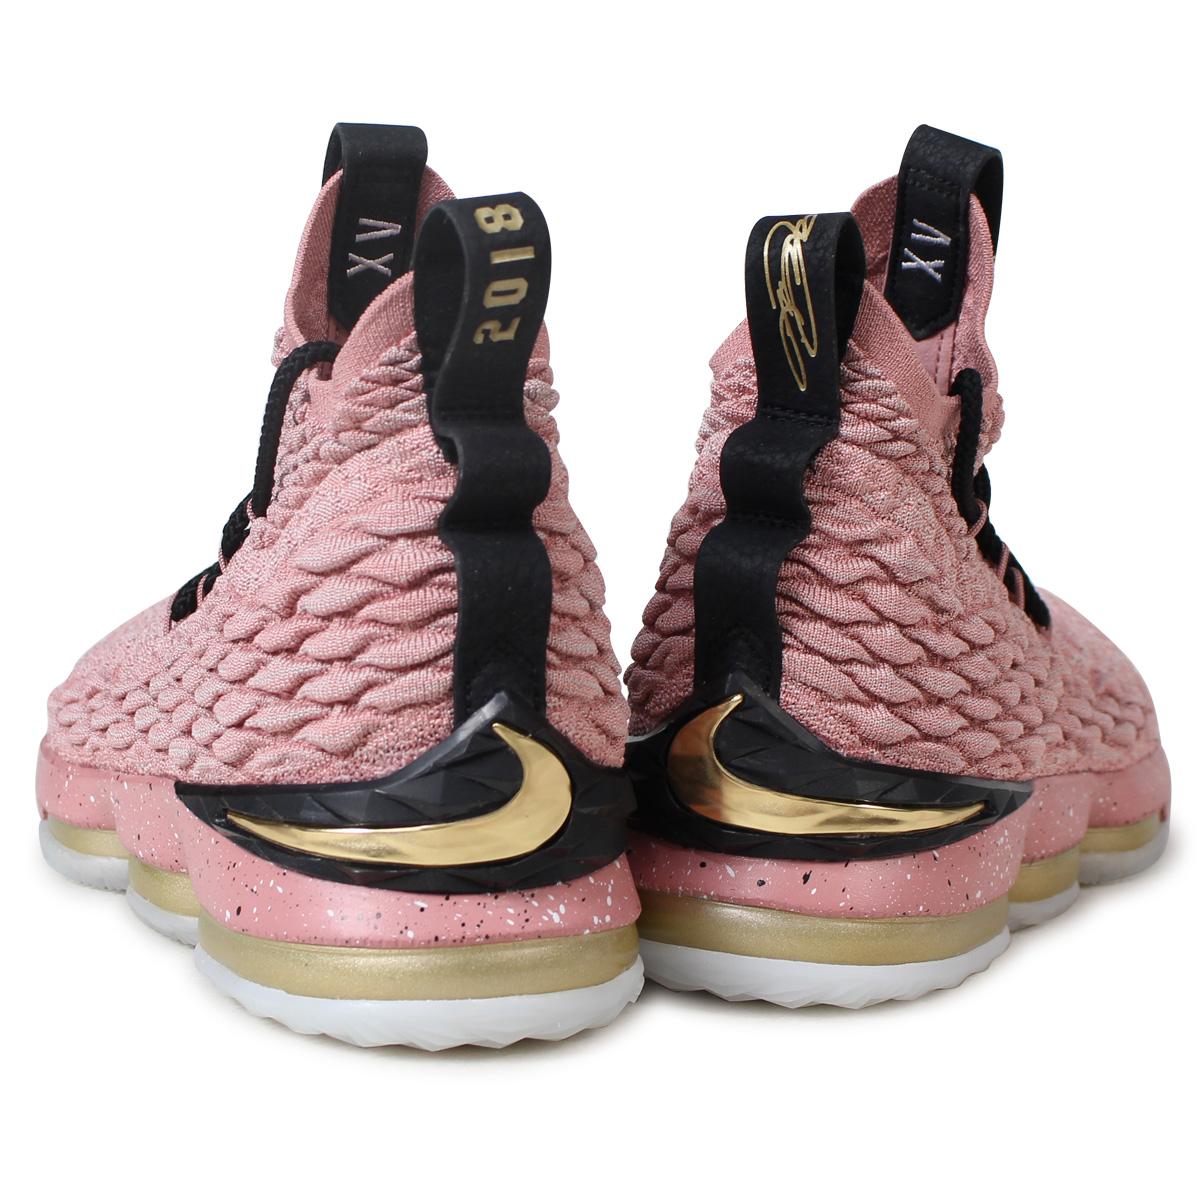 5ec43d88455 ... good nike lebron 15 ep nike revlon 15 sneakers men aa3857 600 pink 185  fe914 c6742